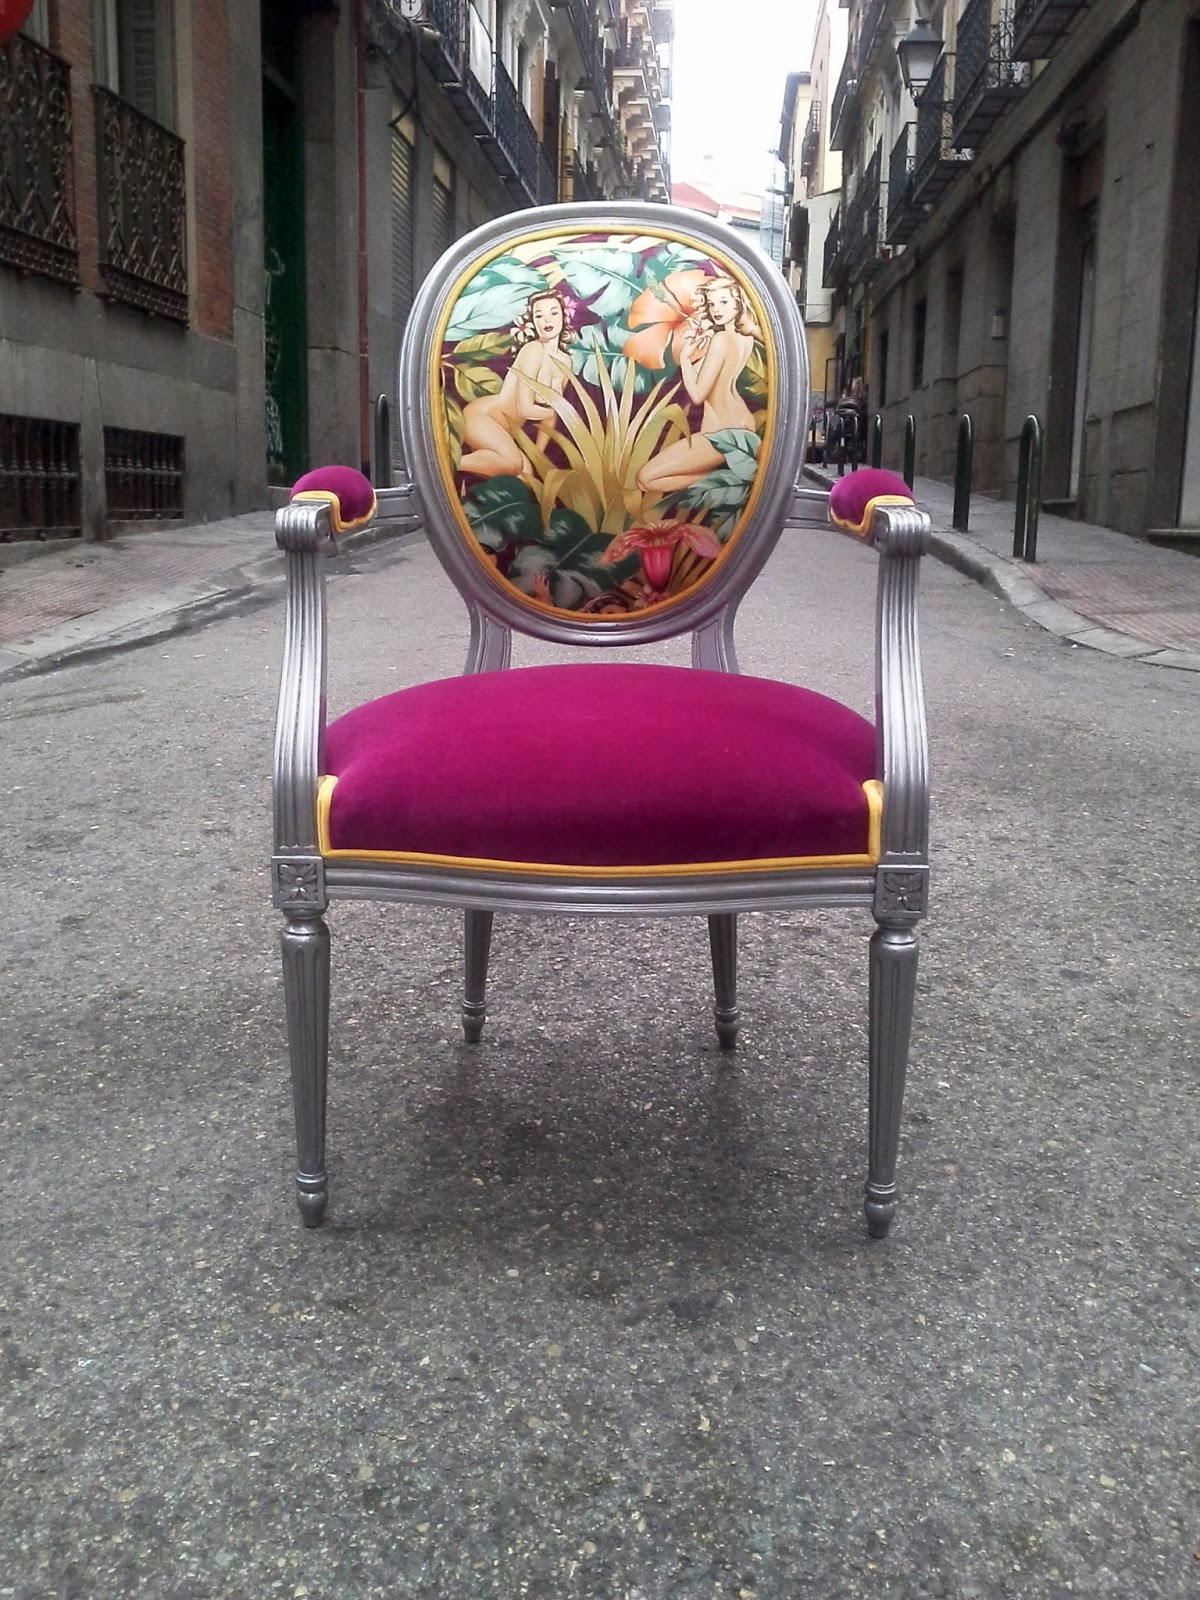 La tapicera silla luis xvi tapizada con tela de pin ups - Sillas provenzal tapizadas ...